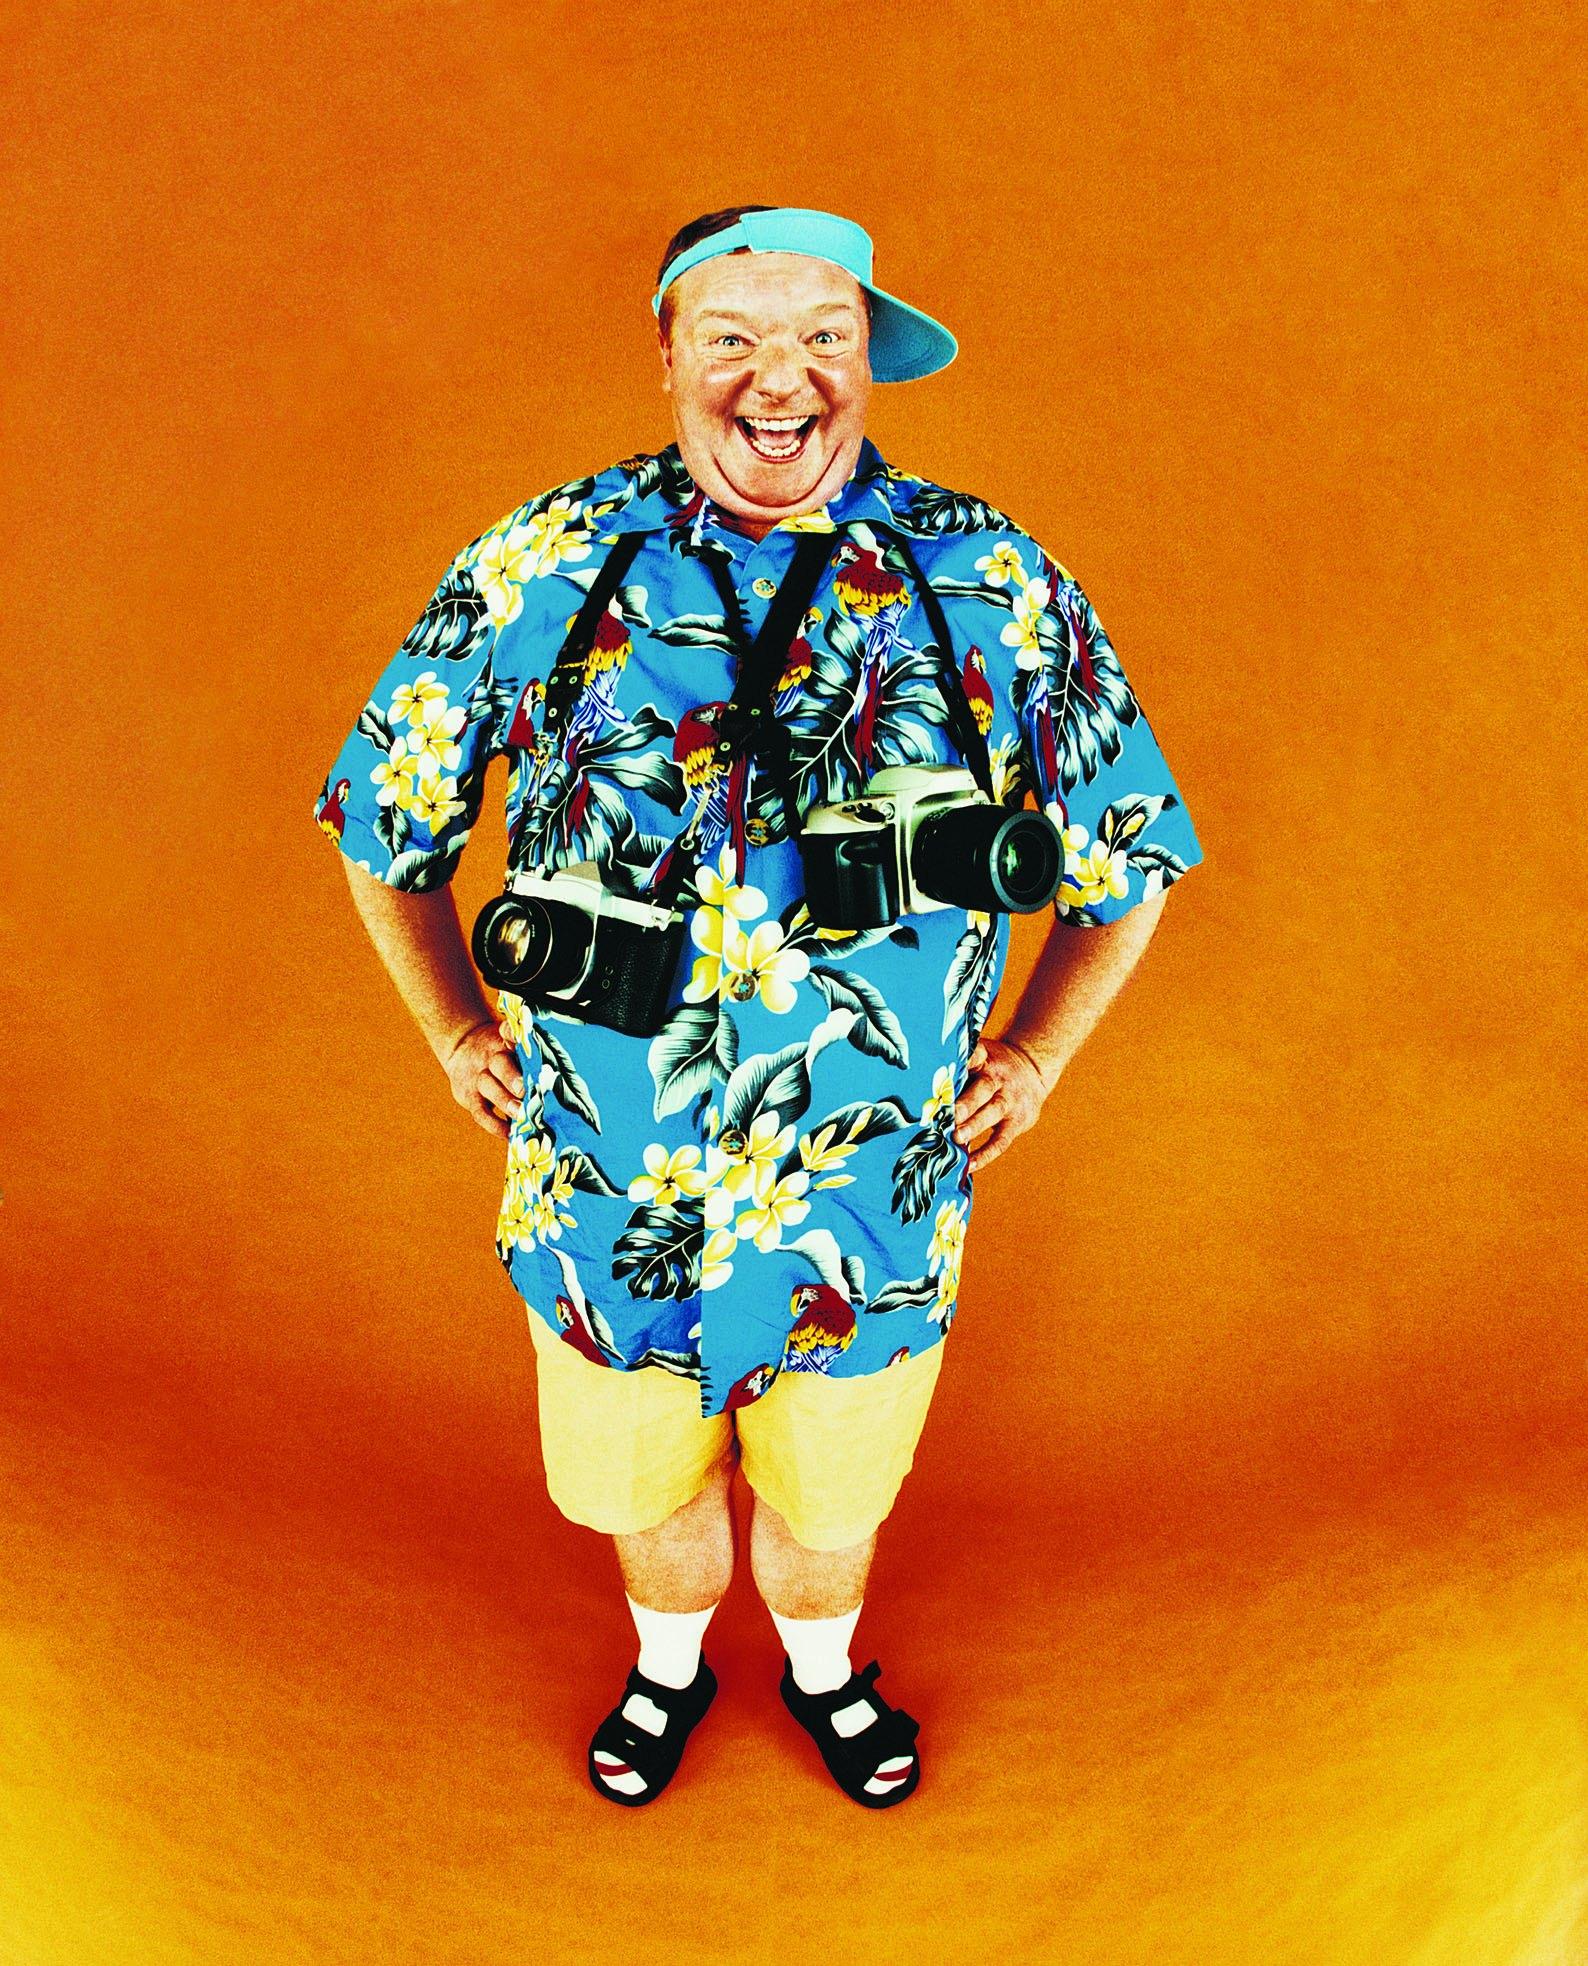 How to Make an Easy-To-Do Tacky Tourist Costume | eHow | 1588 x 1966 jpeg 662kB